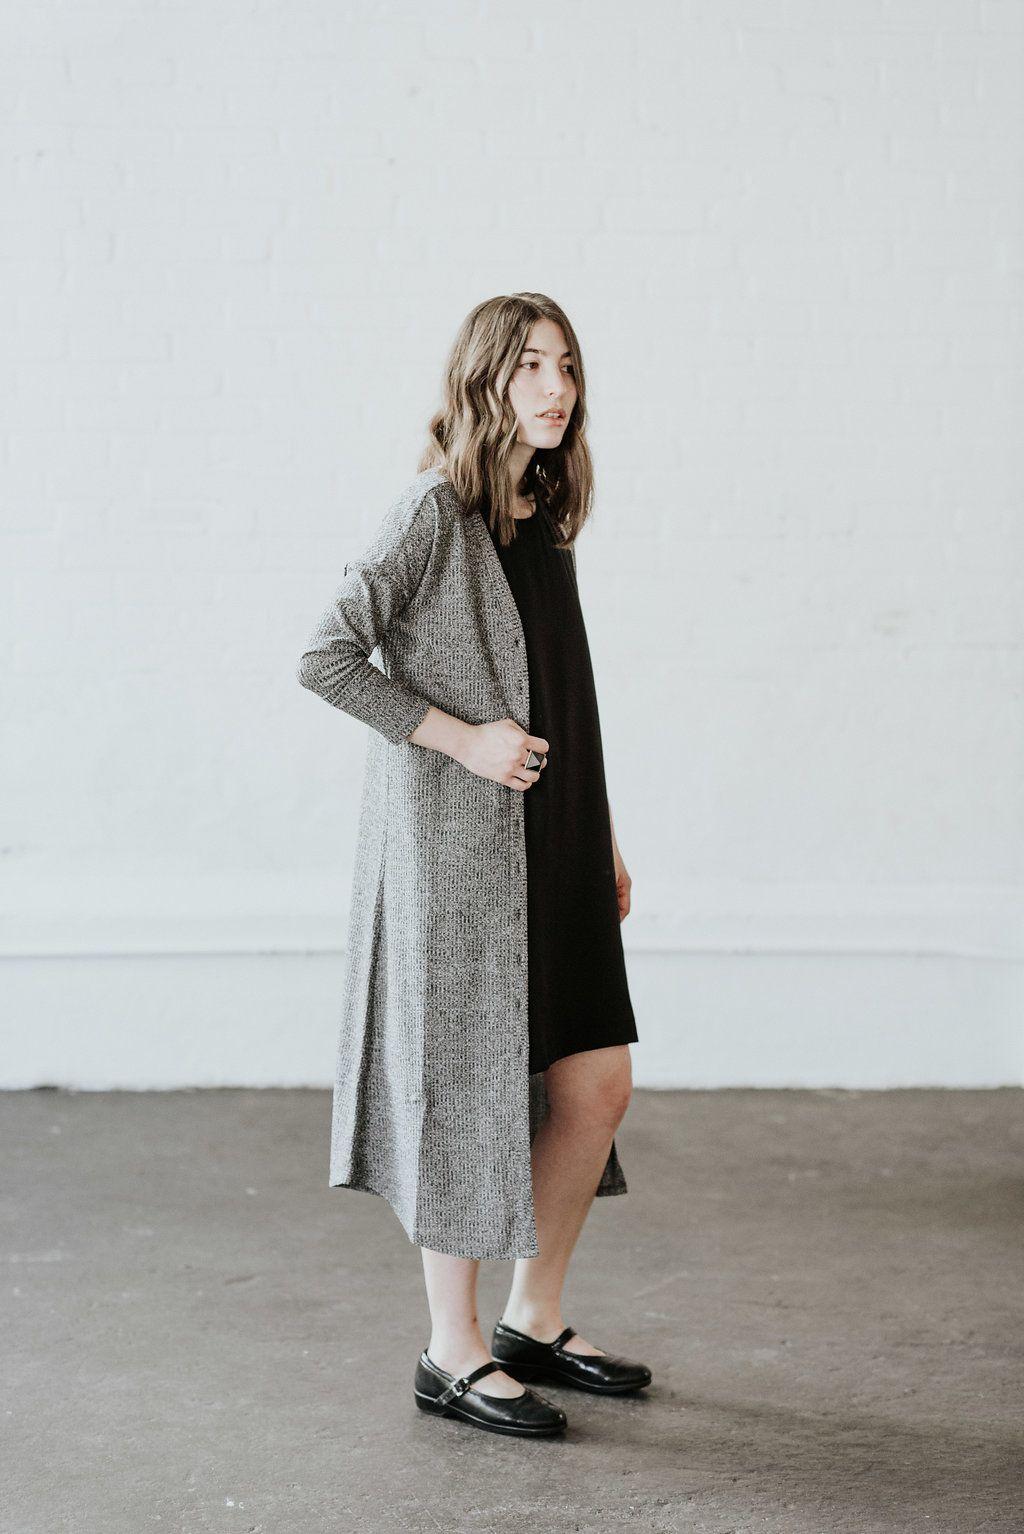 5140b7b39e2a58 The Long Cardigan by VETTA   Miriam wears size M   Made in USA    #realwomenphotoshoot #sustainablefashion #madeinusa #dustercardigan  #fallfashion #fallstyle